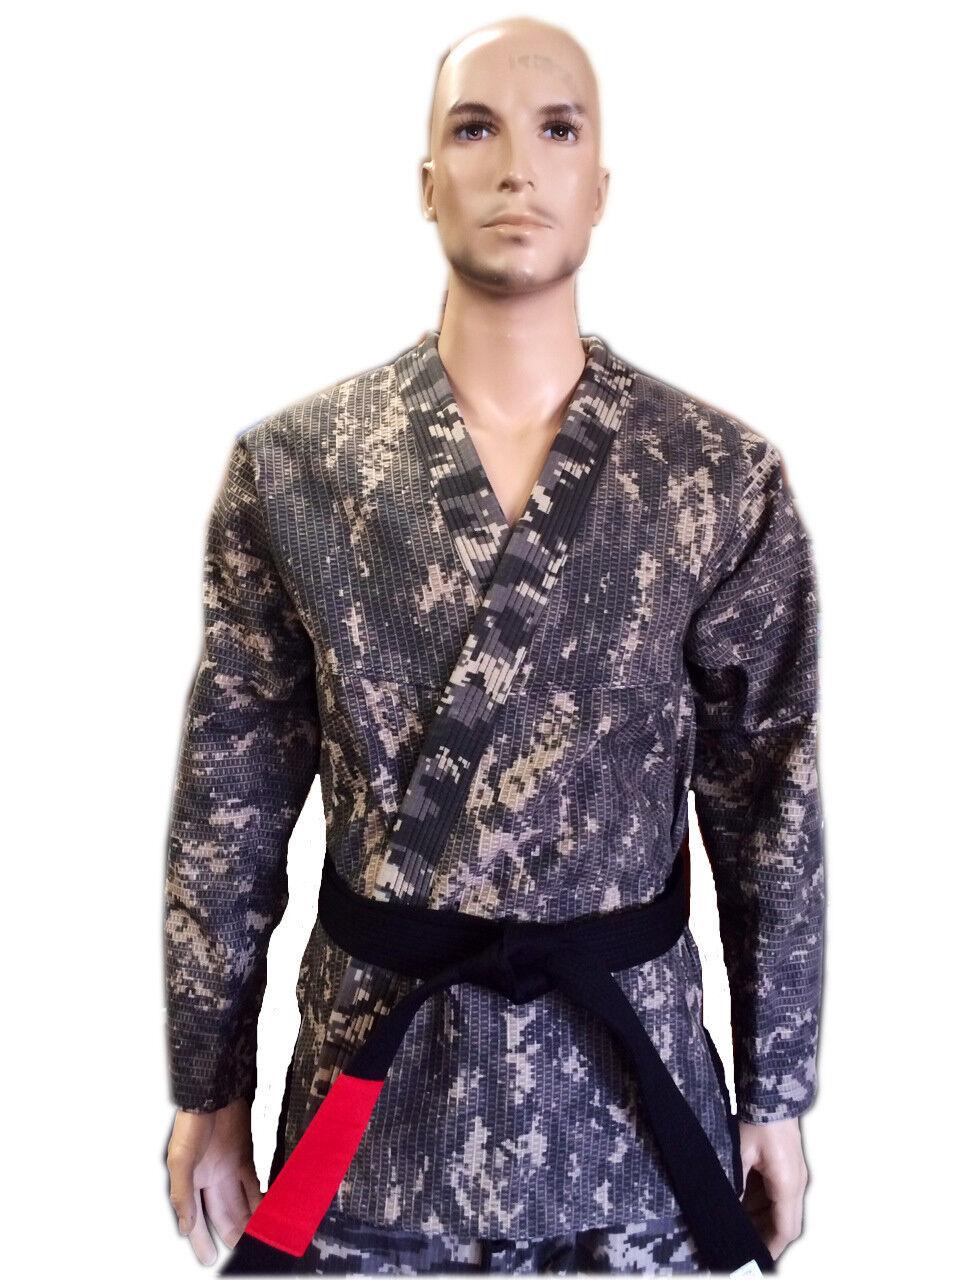 Woldorf  USA BJJ jiu jitsu Kimono gold Weave Digital Camouflage Uniform gi NOLOGO  factory outlets